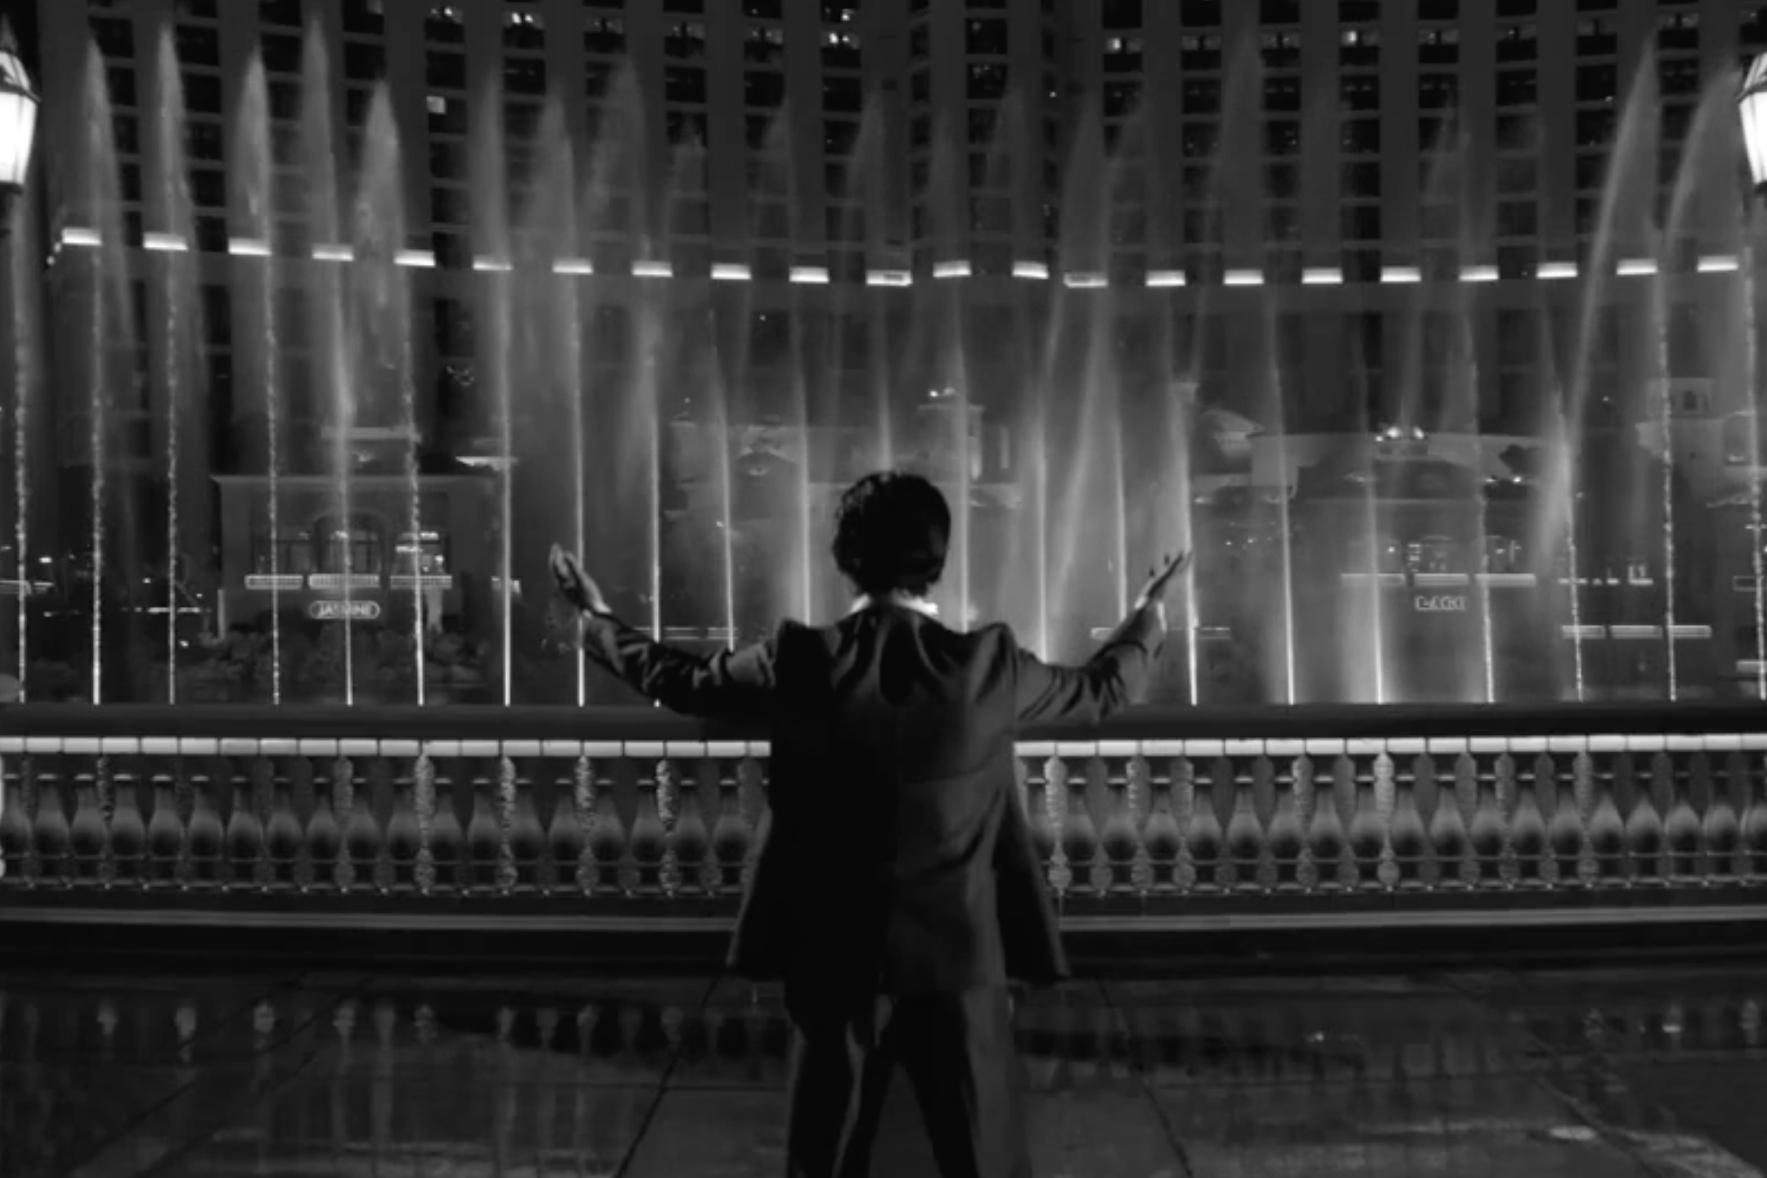 Bellagio's exquisite films capture joy on the Las Vegas strip